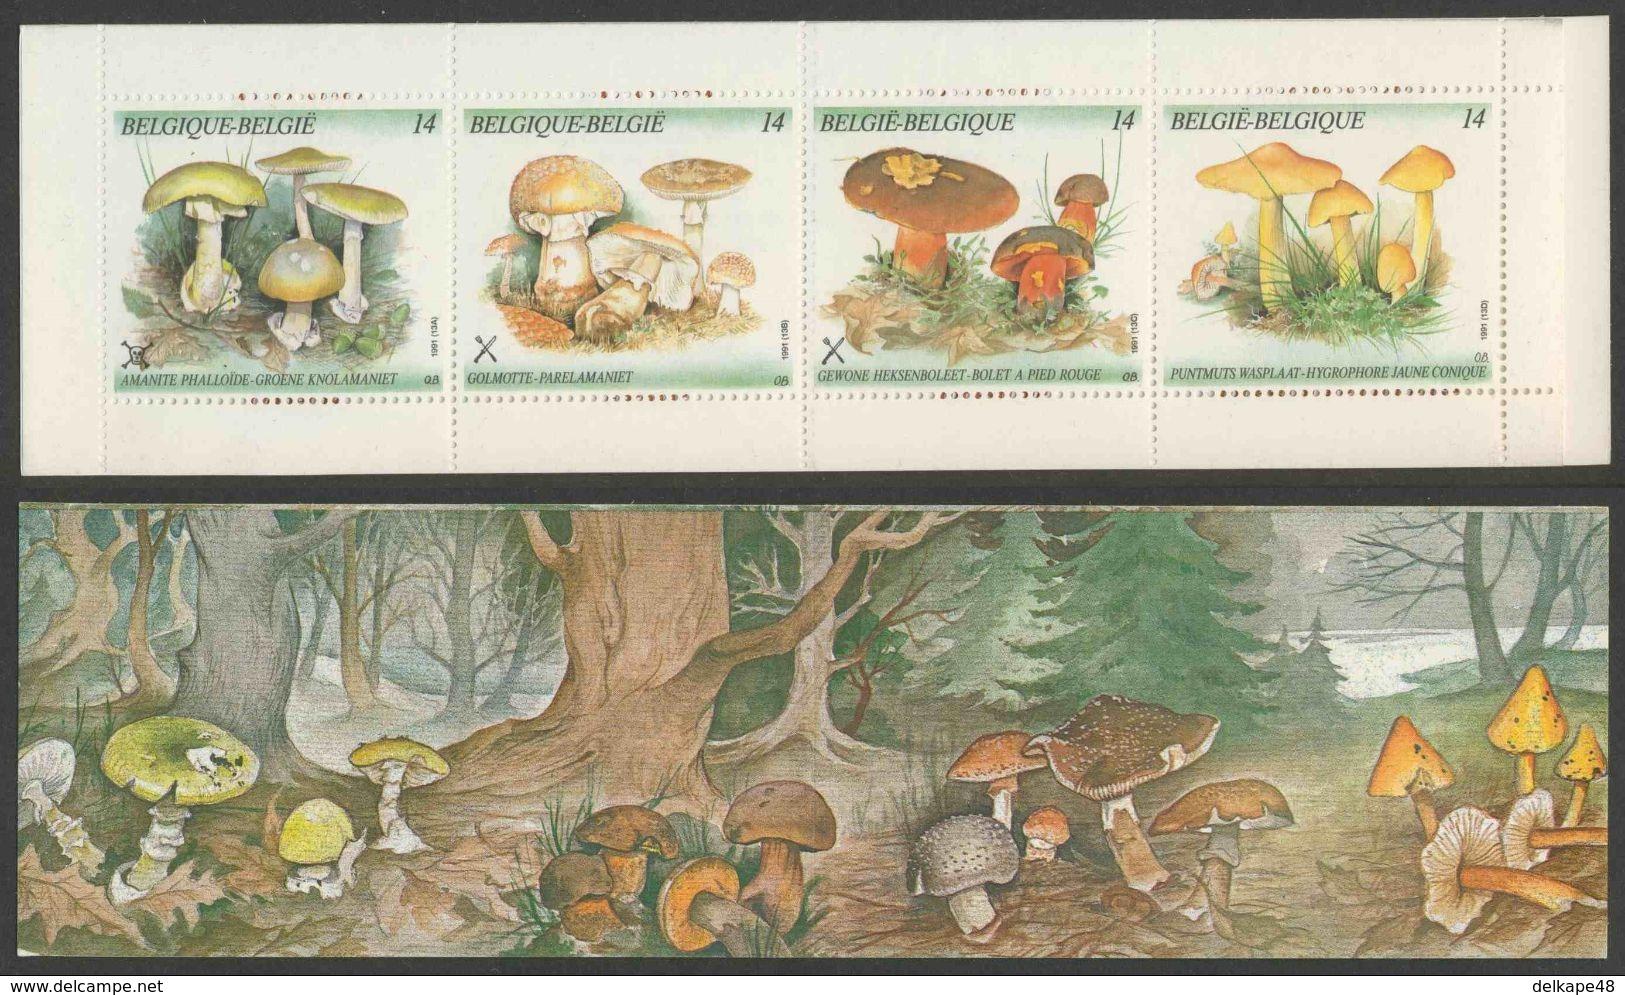 Belgie Belgique Belgium 1991 MH32 Mi 2470-2473 ** Amanita Phalloides, Amanita Rub., Boletus Erythropus, Hygrocybe Persis - Paddestoelen